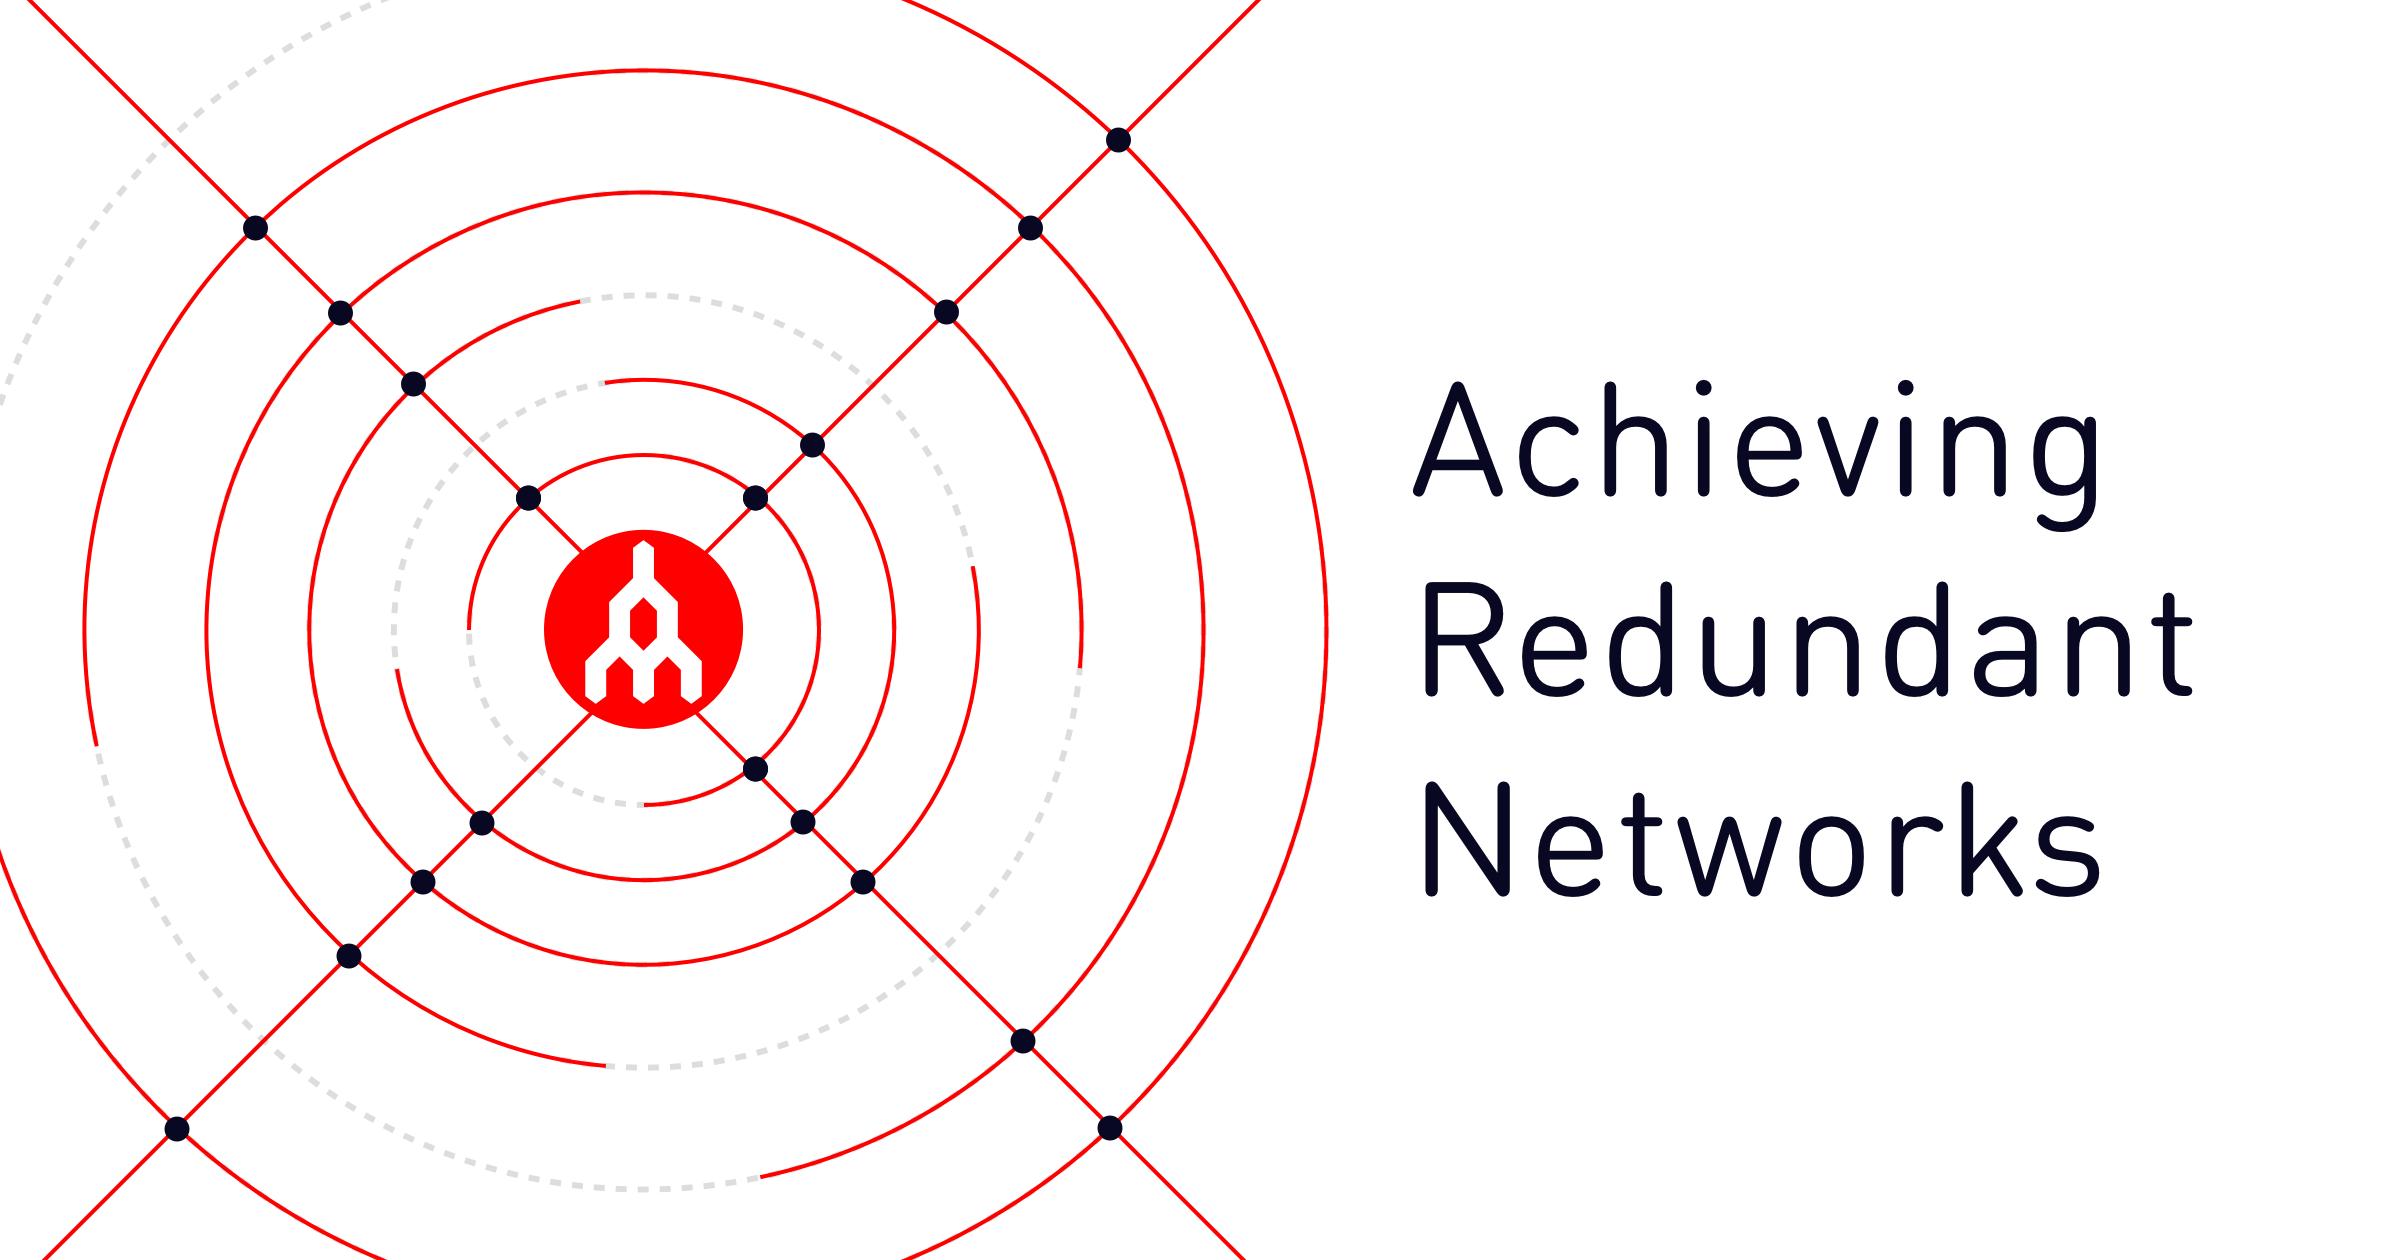 Achieving Redundant Networks Blog Graphic